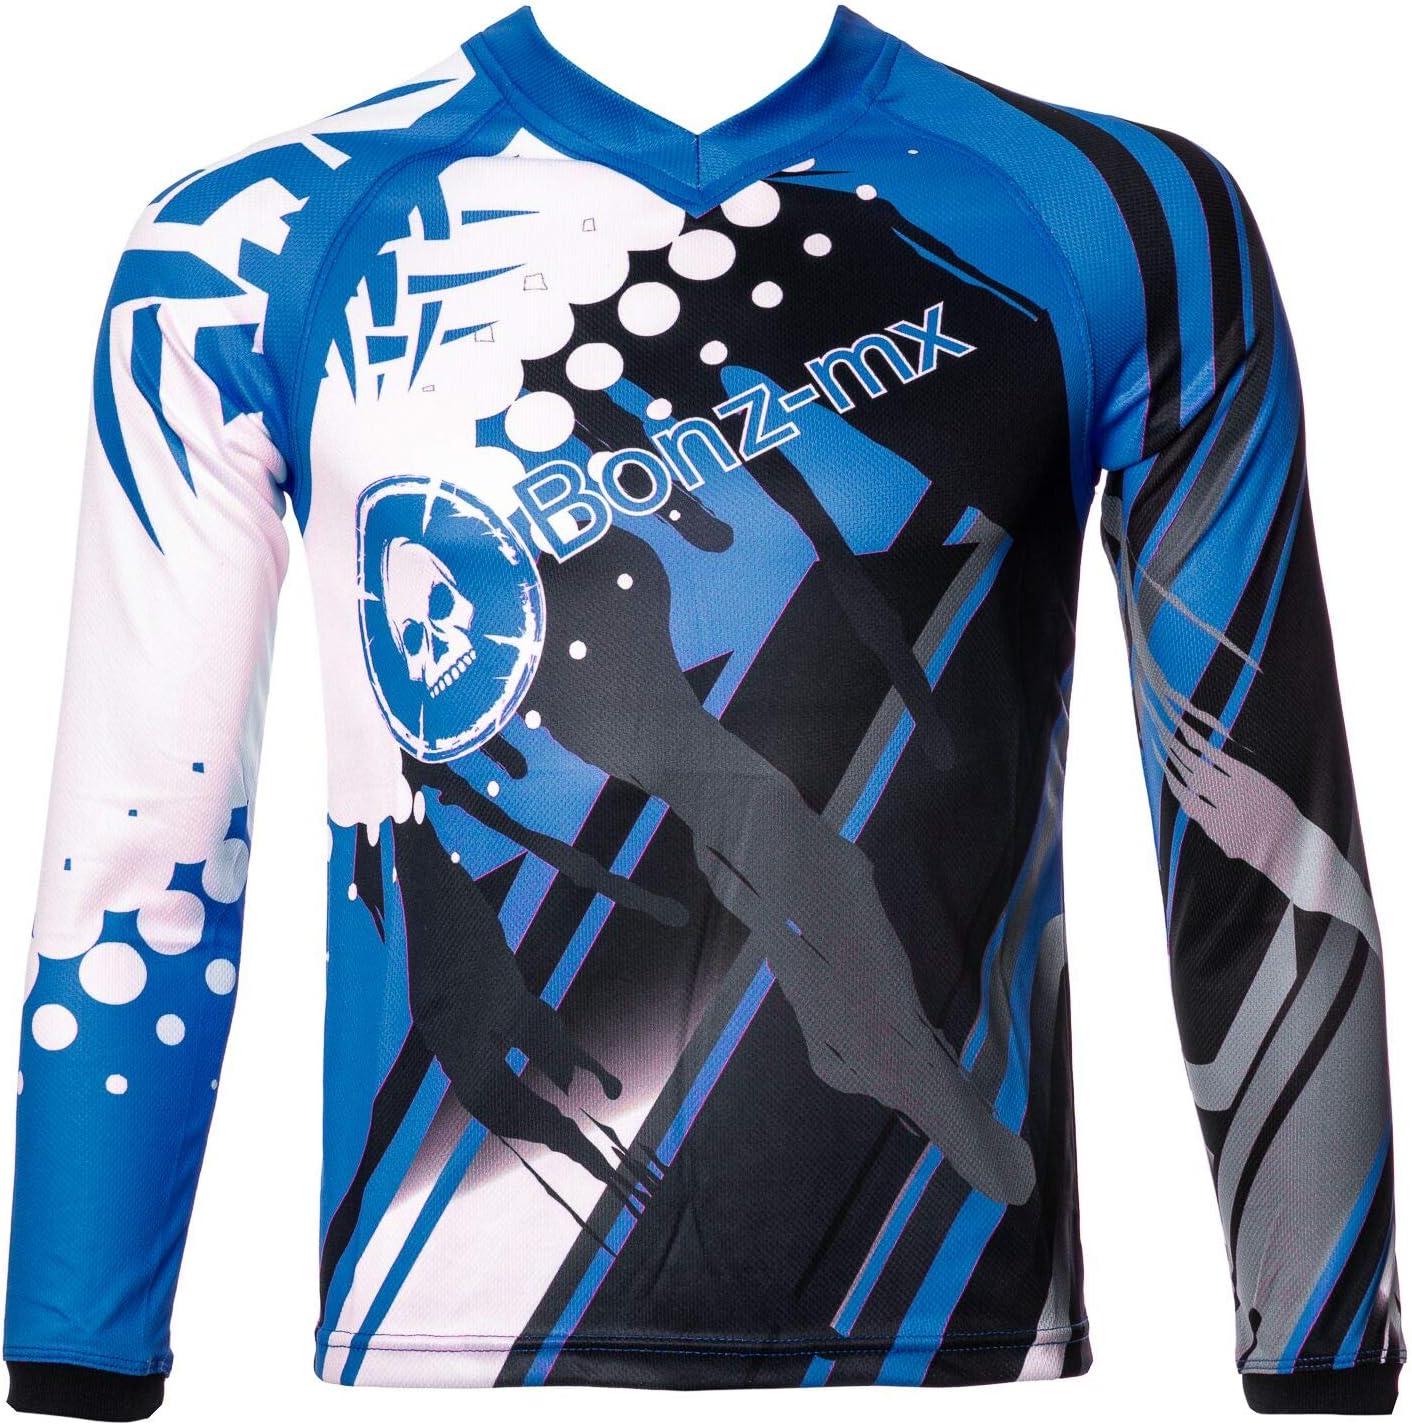 Bonz Mx Kids Quad Dirt Motocross Bmx Enduro Childrens Jersey Top 6-8YRS, BLUE//CHILD